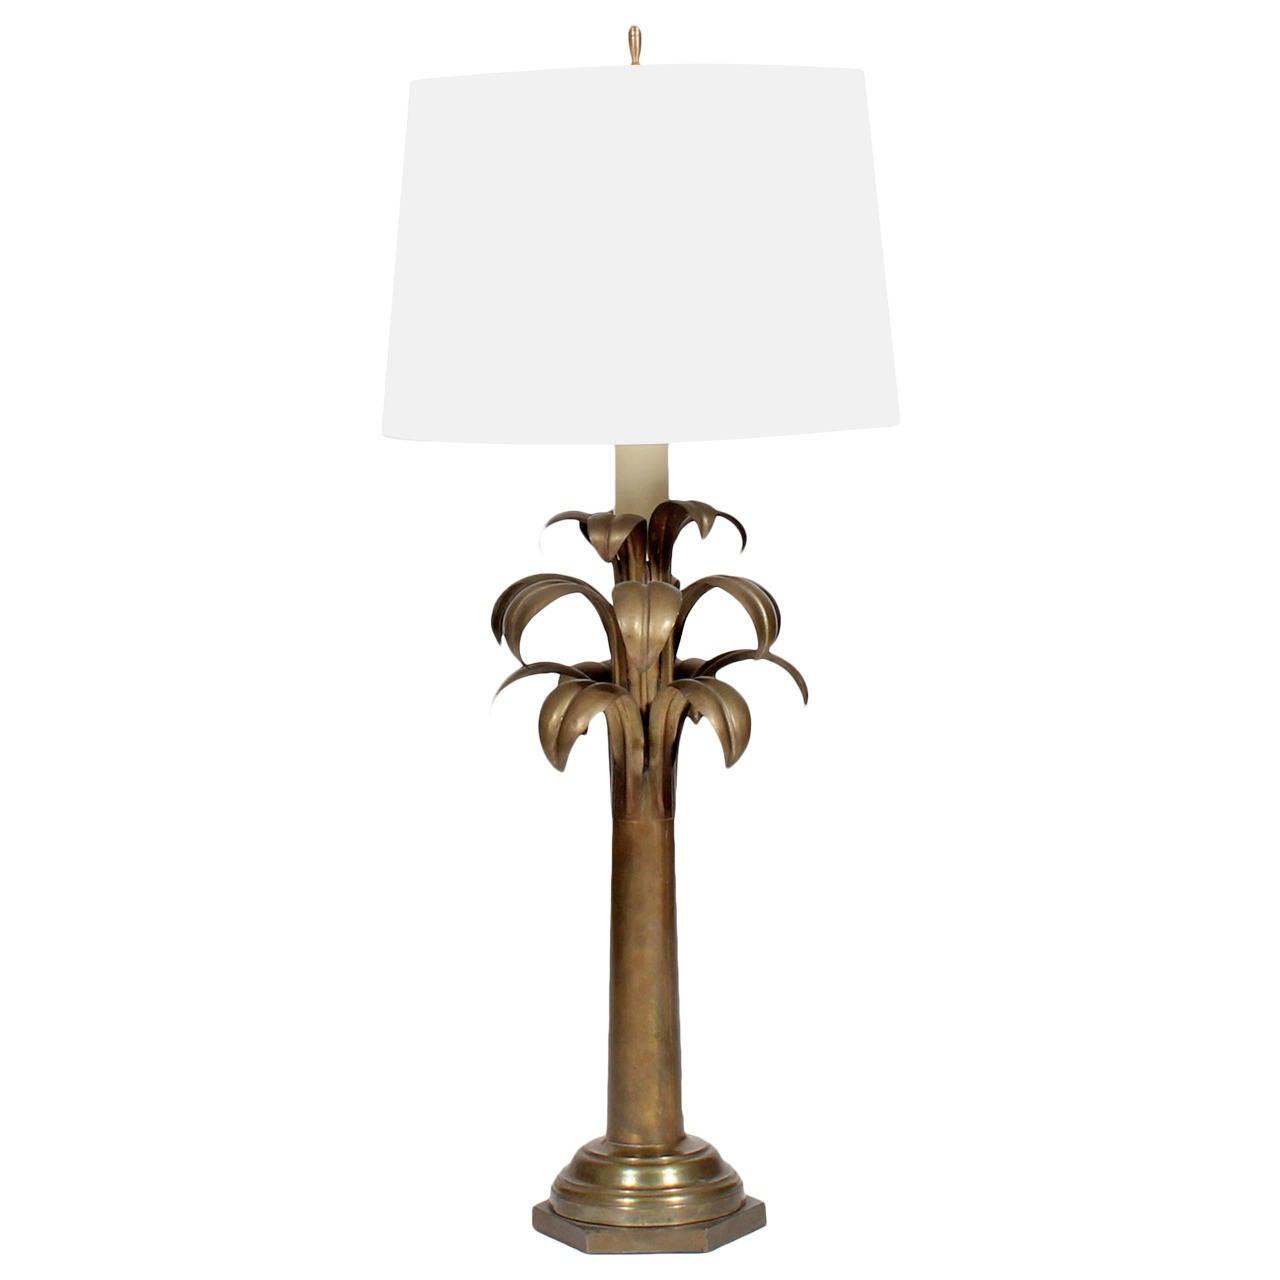 Tall Brass Stylized Palm Tree Lamp At 1stdibs